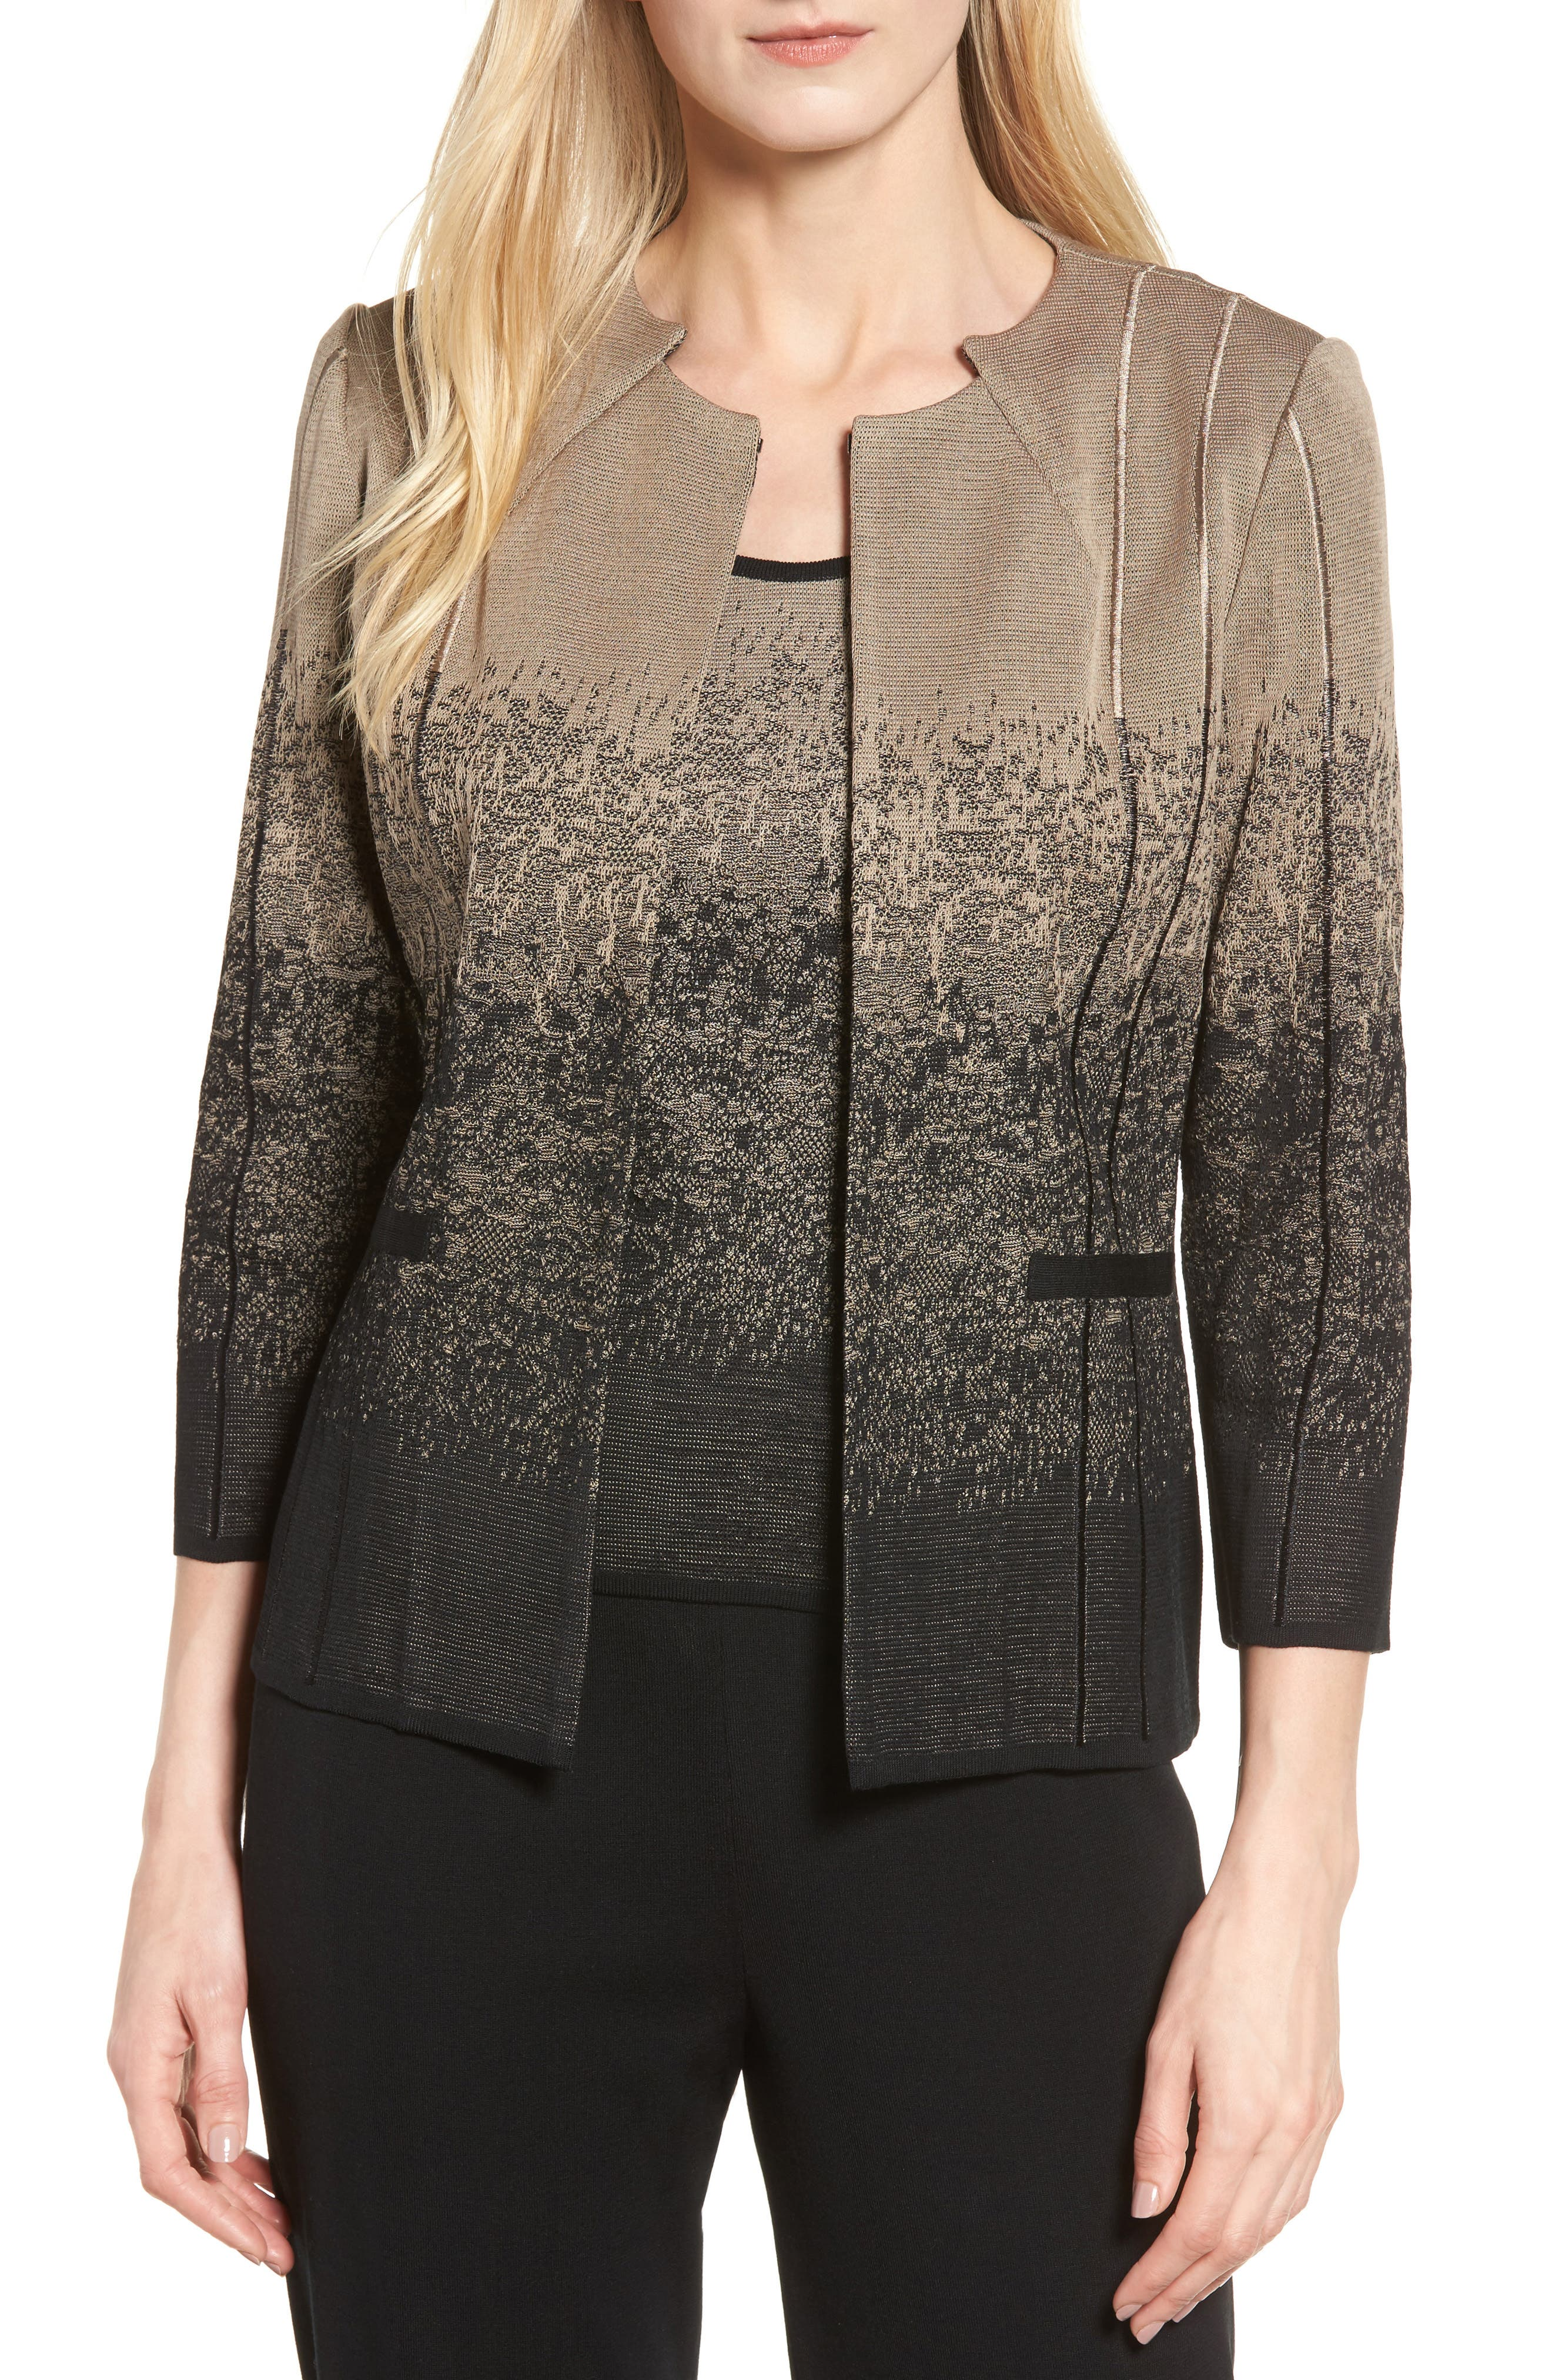 Alternate Image 1 Selected - Ming Wang Jacquard Knit Jacket